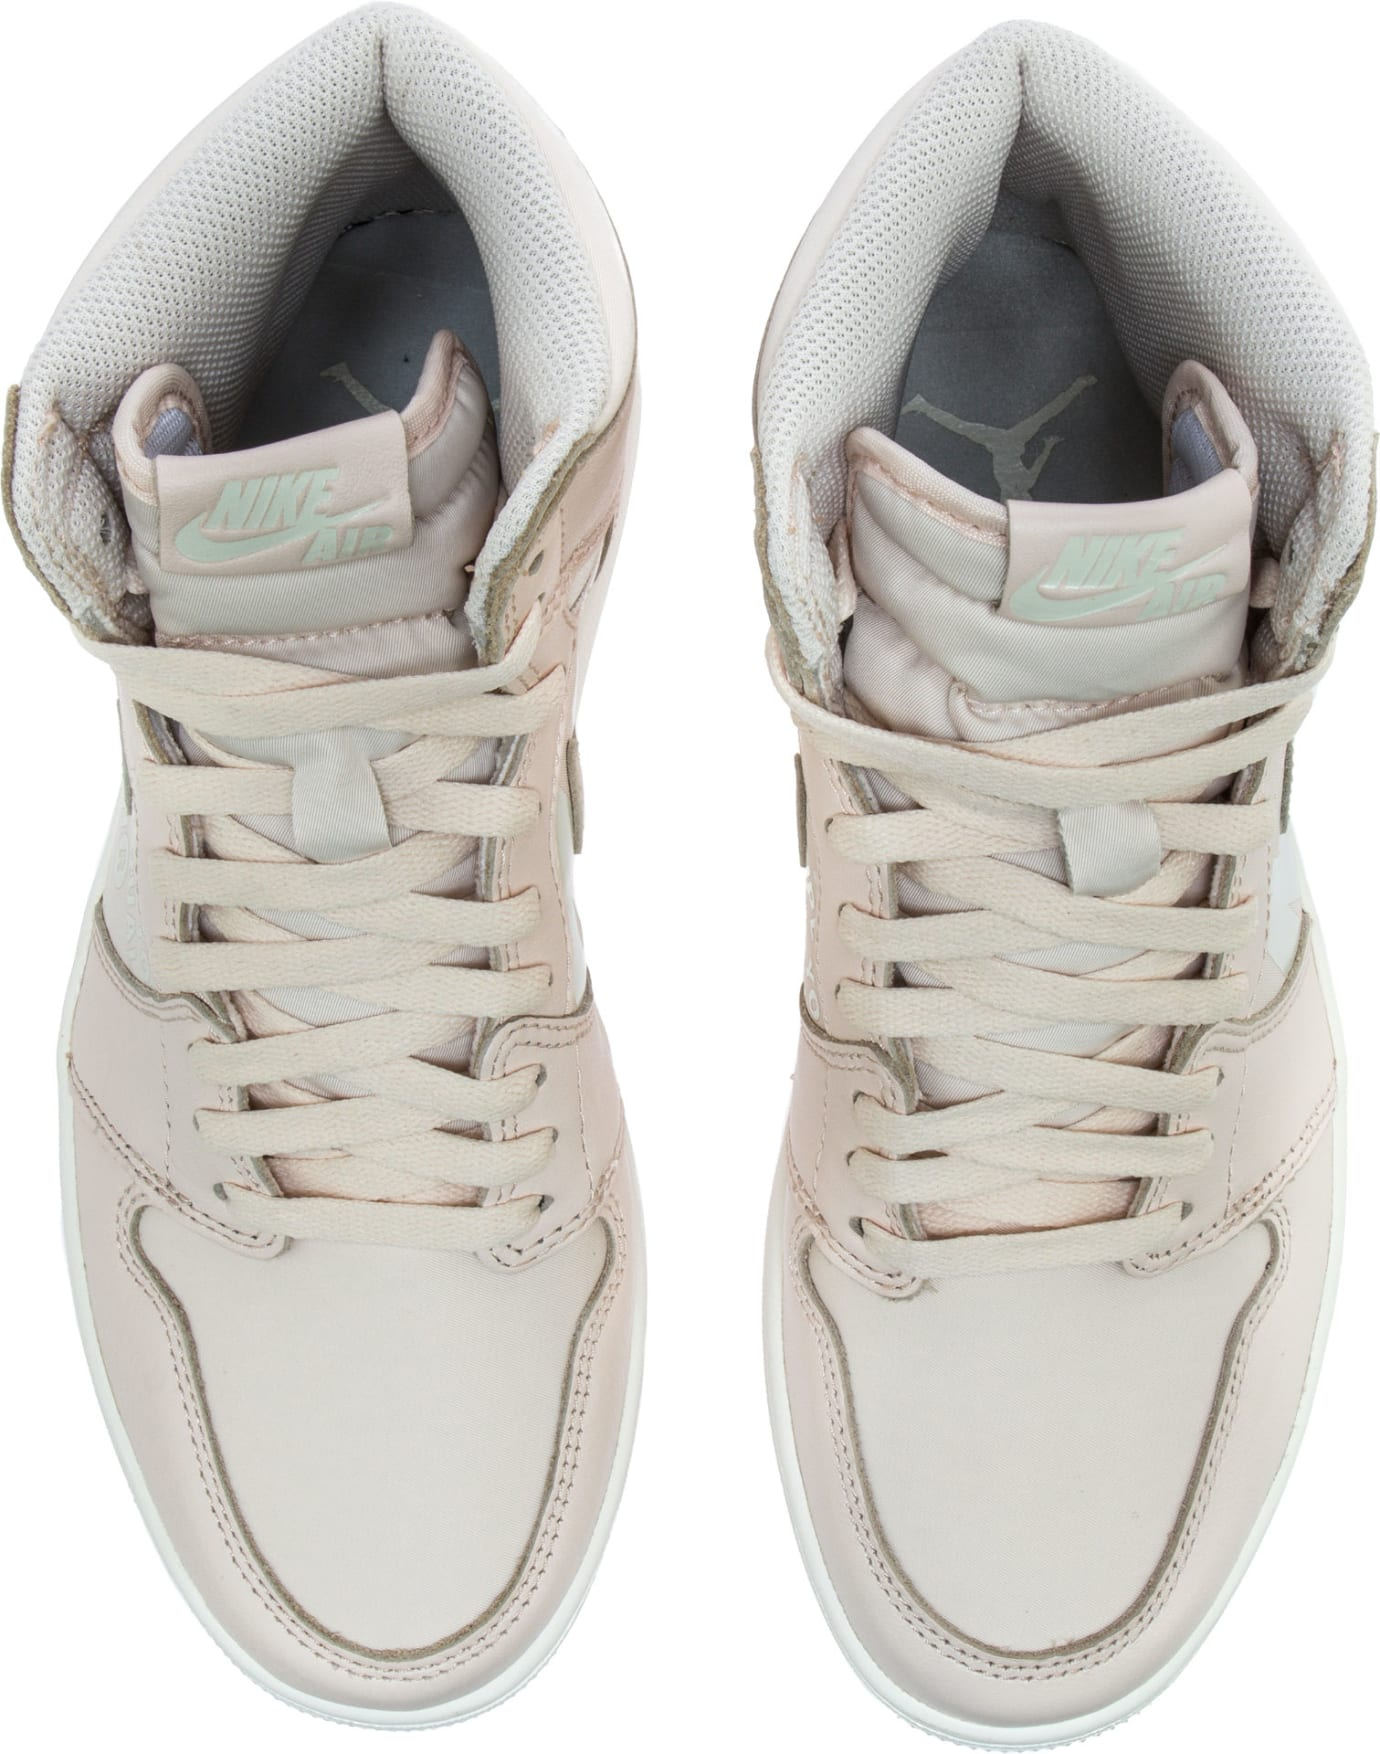 90bae8e4adf2a8 Image via for Shoe Palace · Air Jordan 1 High Guava Ice Sail Release Date  555088-801 Top